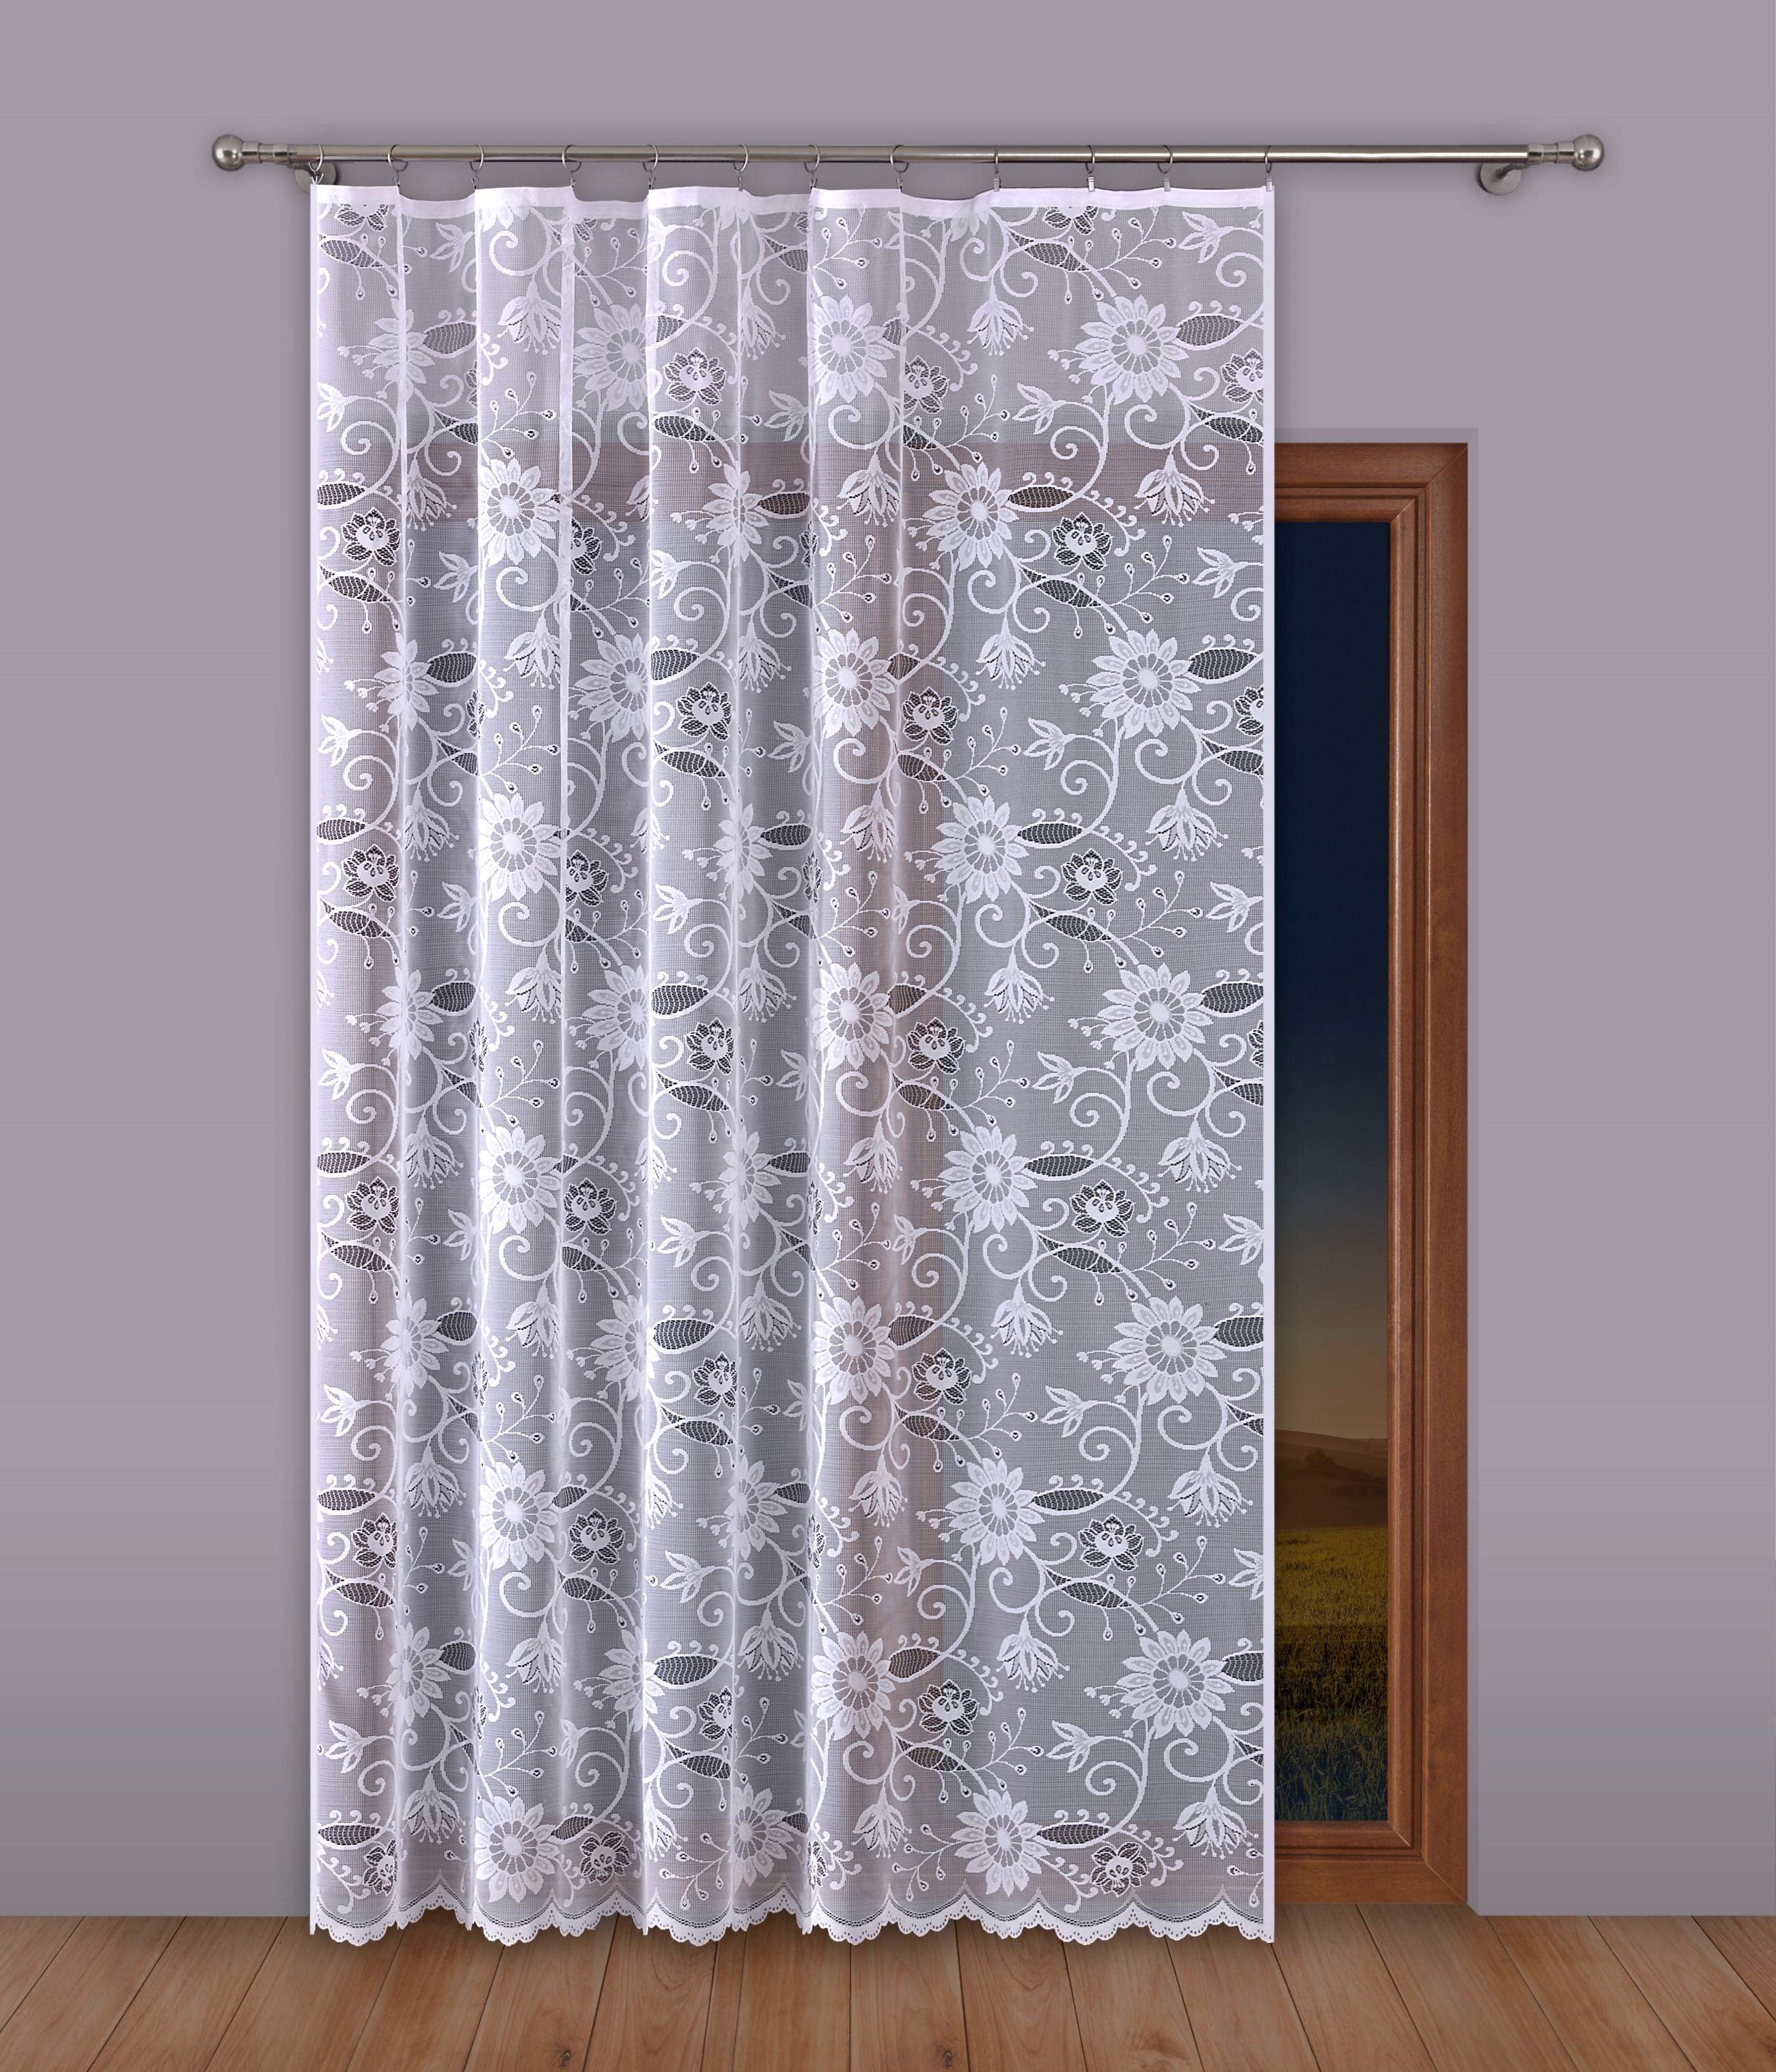 Шторы Primavera Классические шторы Beelzebub Цвет: Белый шторы primavera классические шторы maev цвет белый